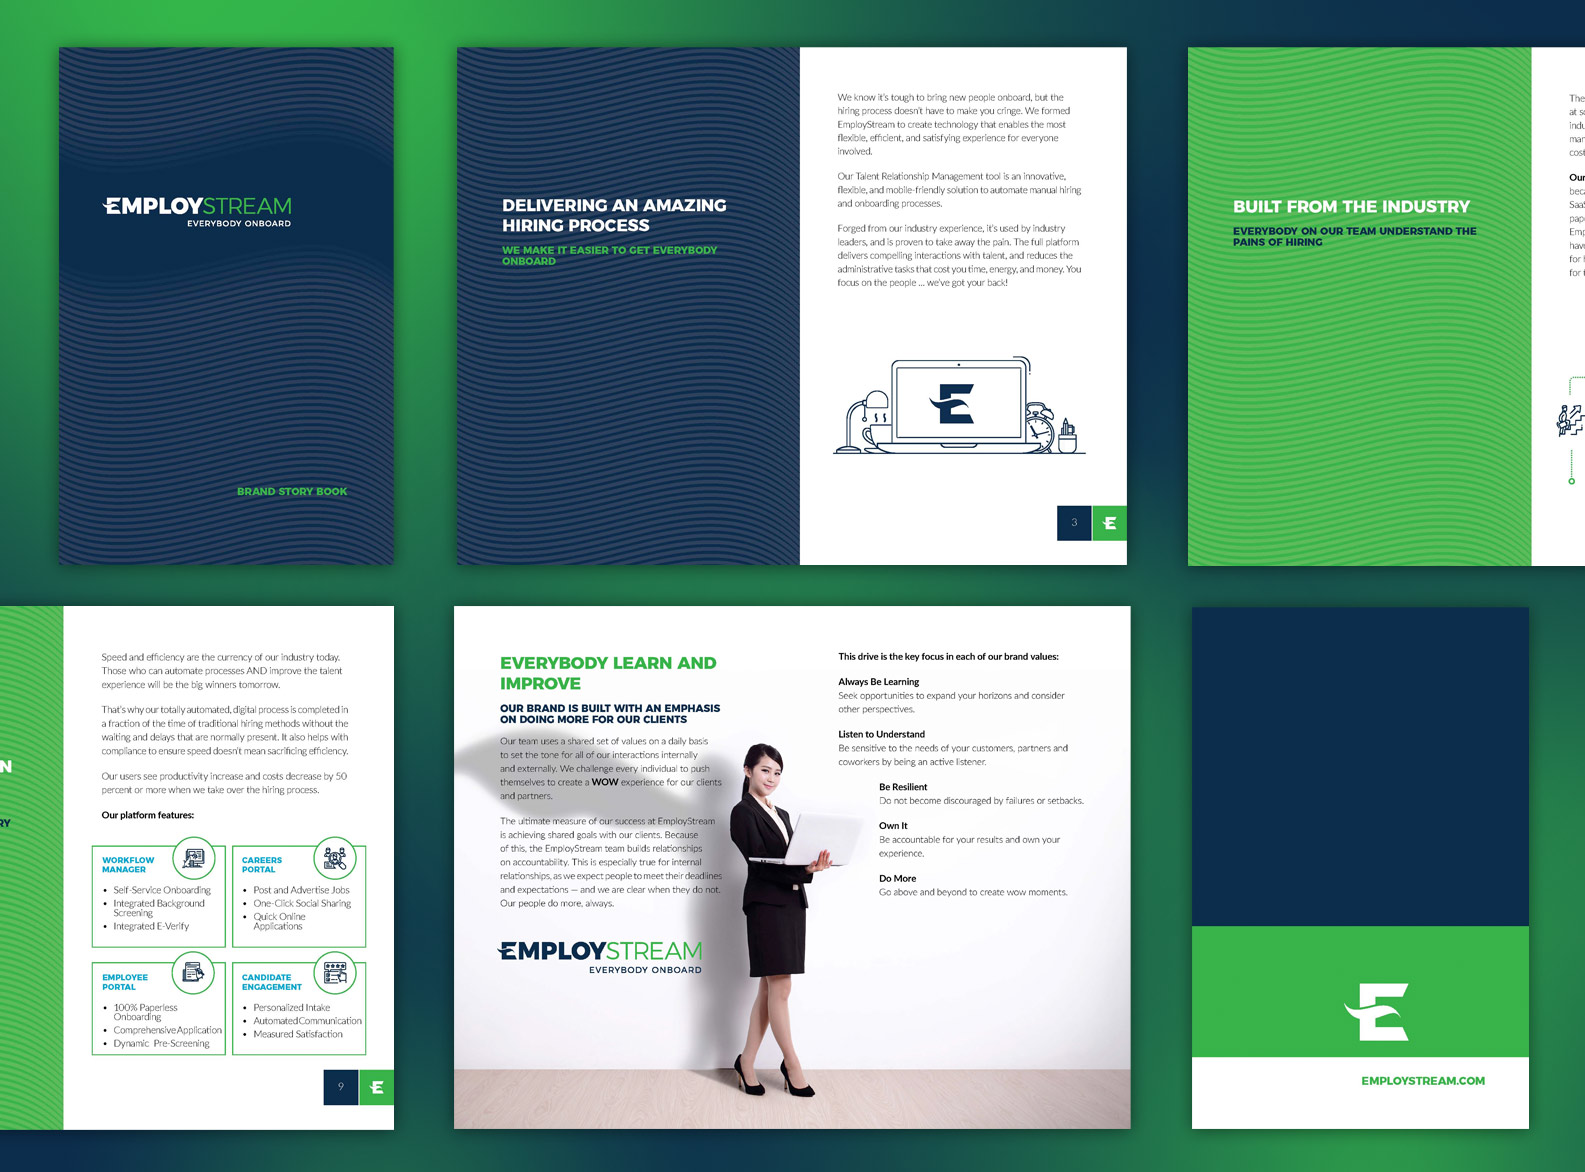 EmployStream brand book